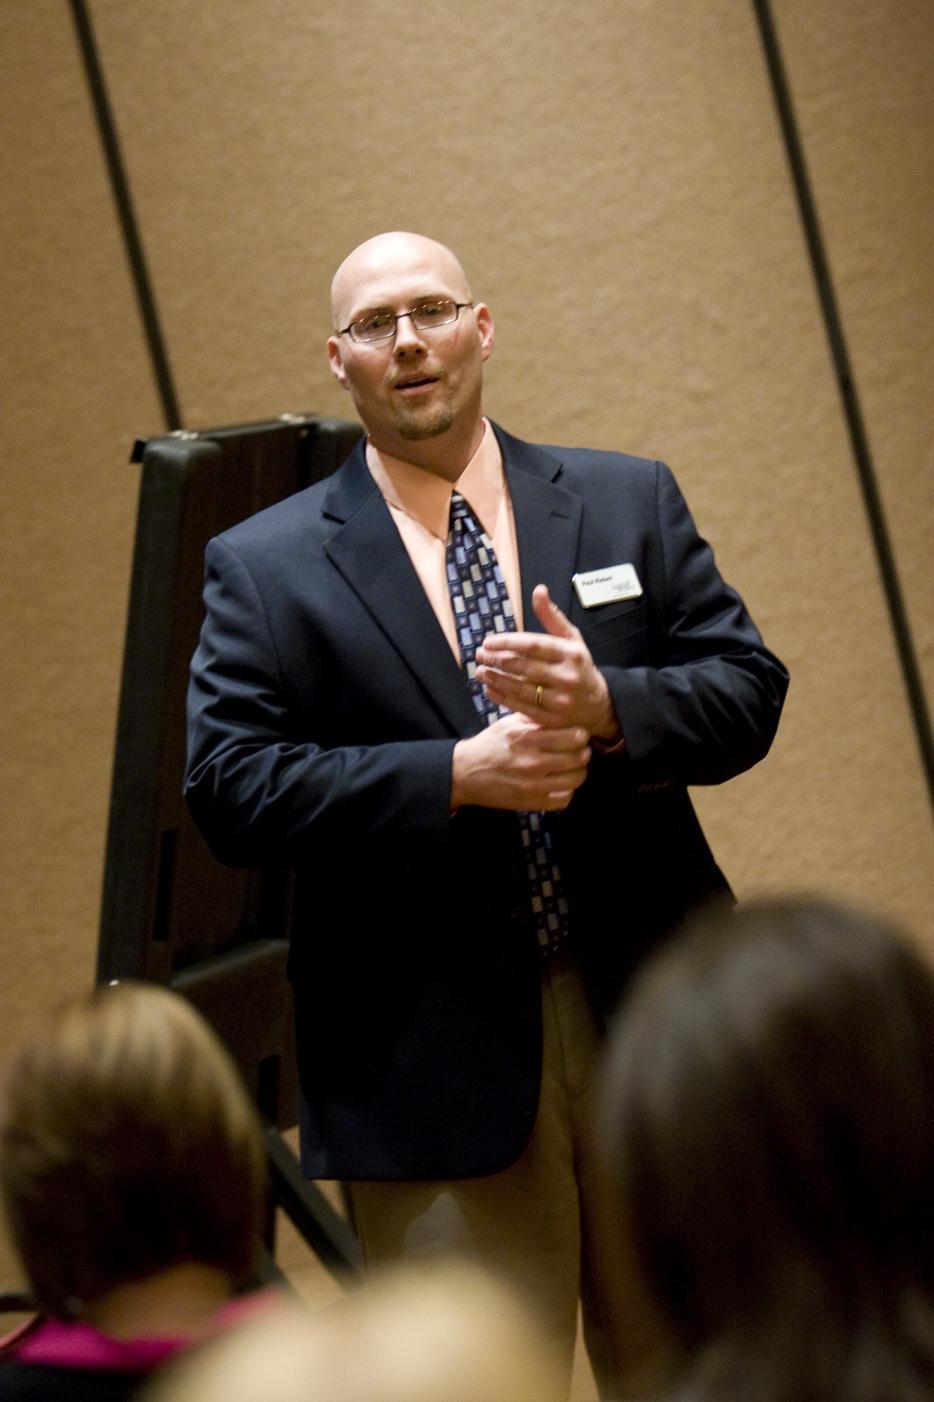 Leadership Resources Paul Rieken Customer Service